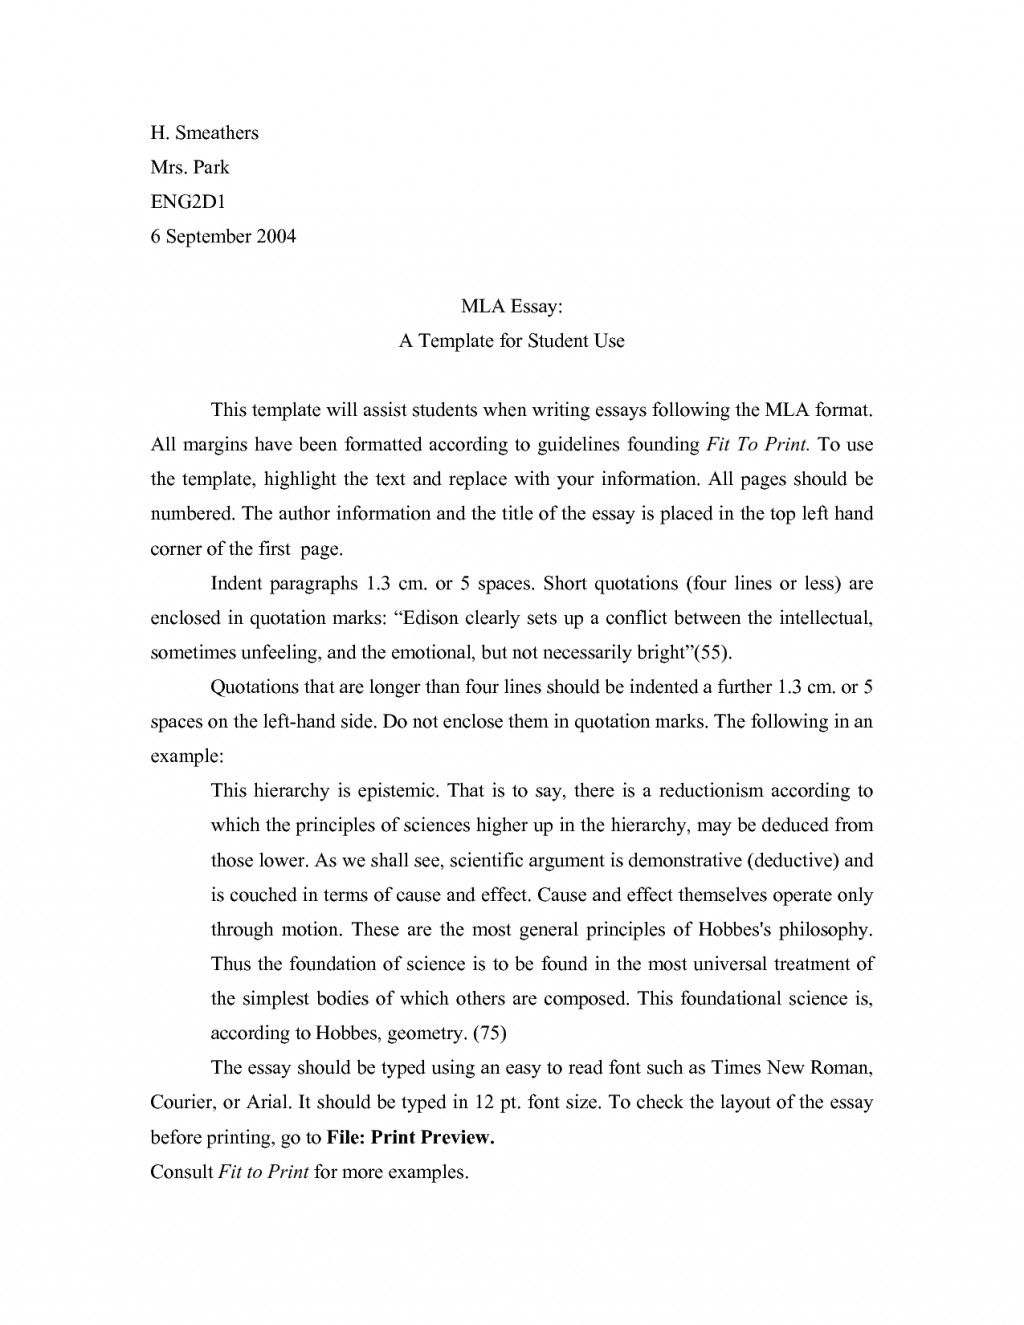 013 Ideas Of Mla Format On Essay Targer Golden Dragon Wonderful College Sample Beautiful Example 2017 Comparison Narrative Large